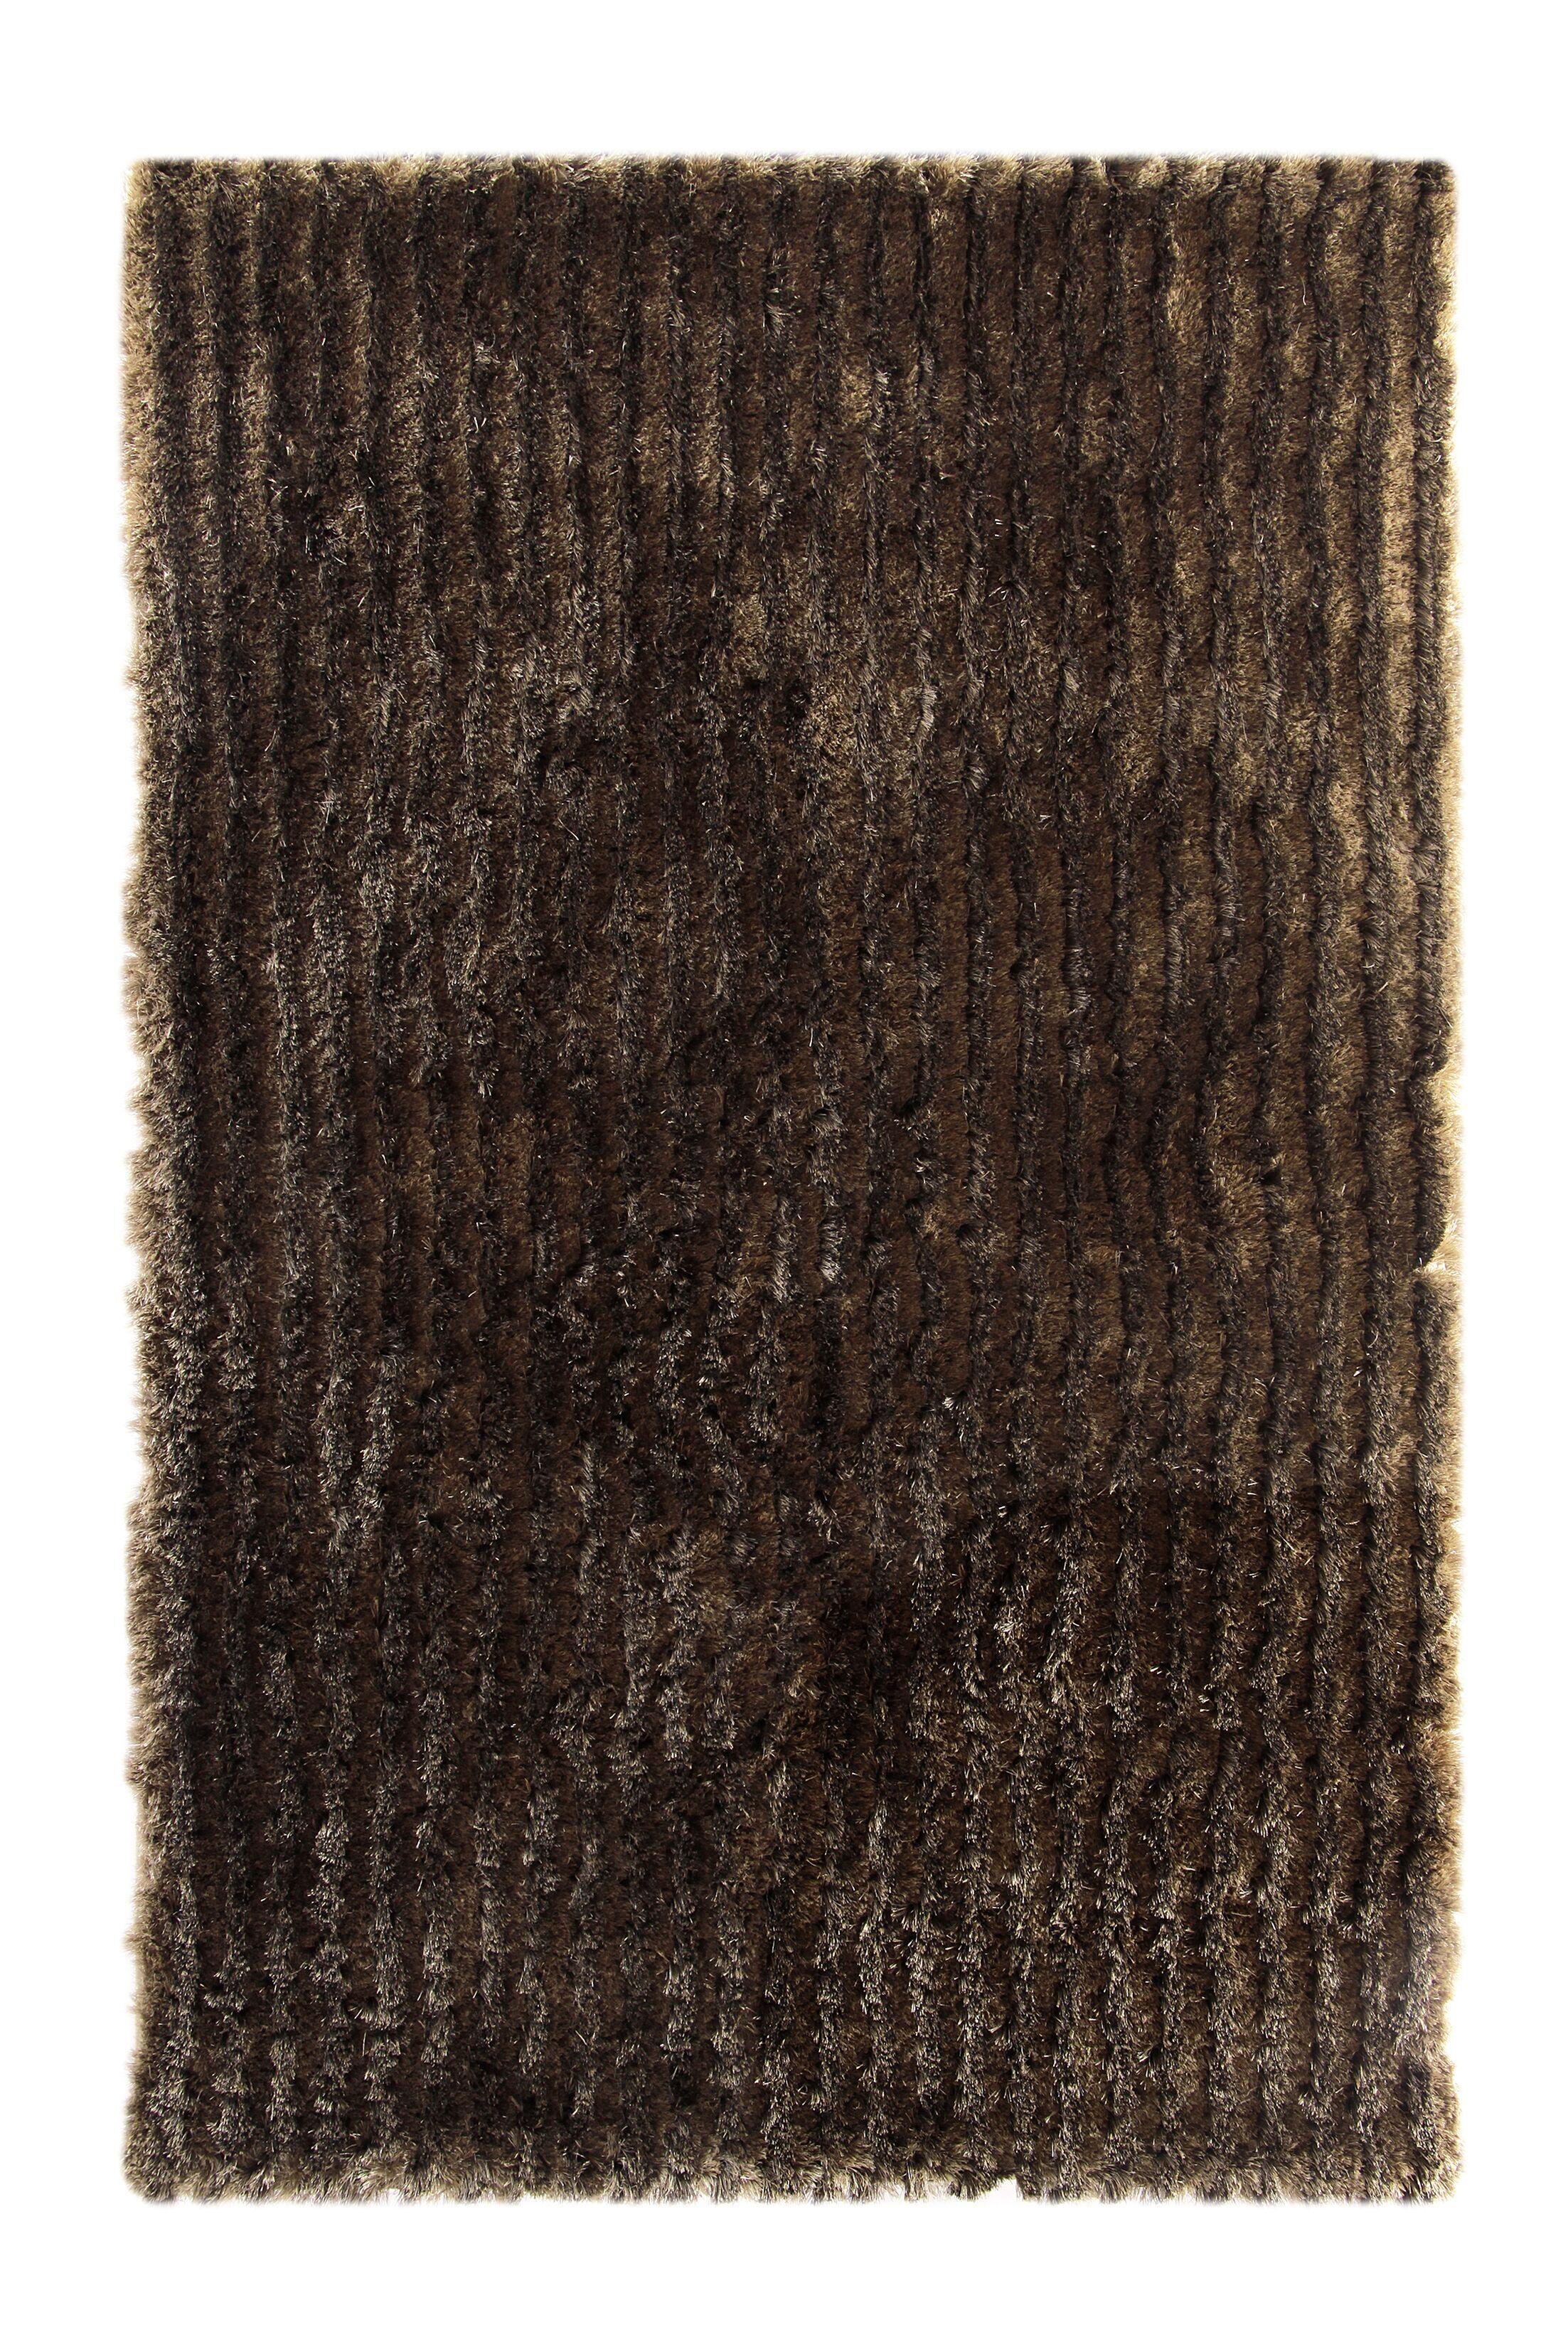 Safari Beige/Olive Rug Rug Size: Rectangle 3' x 5'